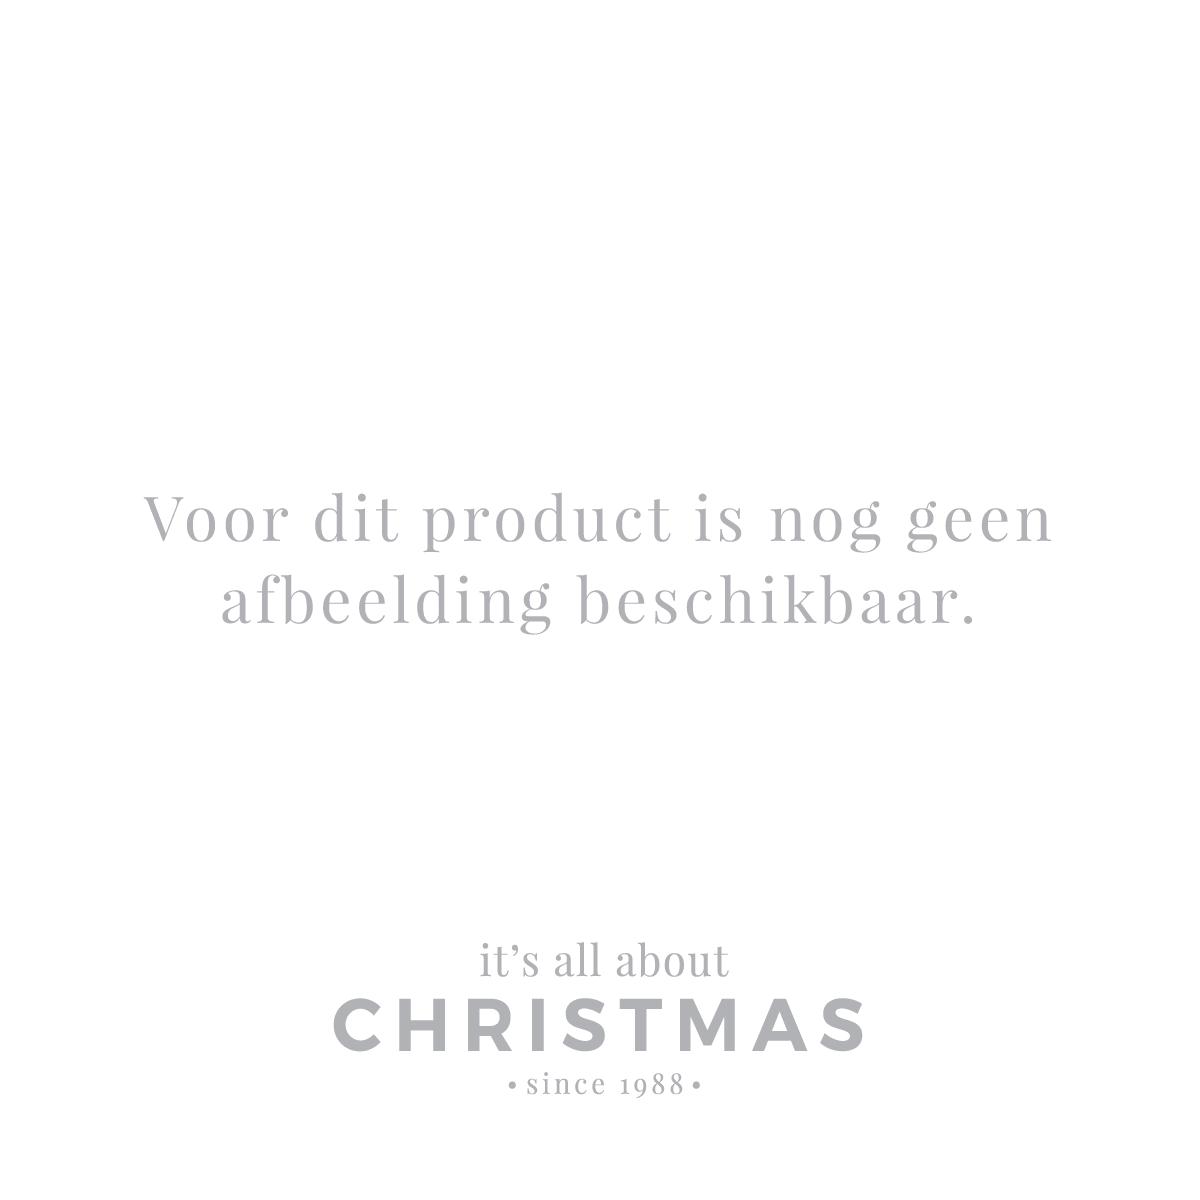 Christbaumkugeln Plastik.24 Plastik Christbaumkugeln Lila Mix 2 5 Cm It S All About Christmas